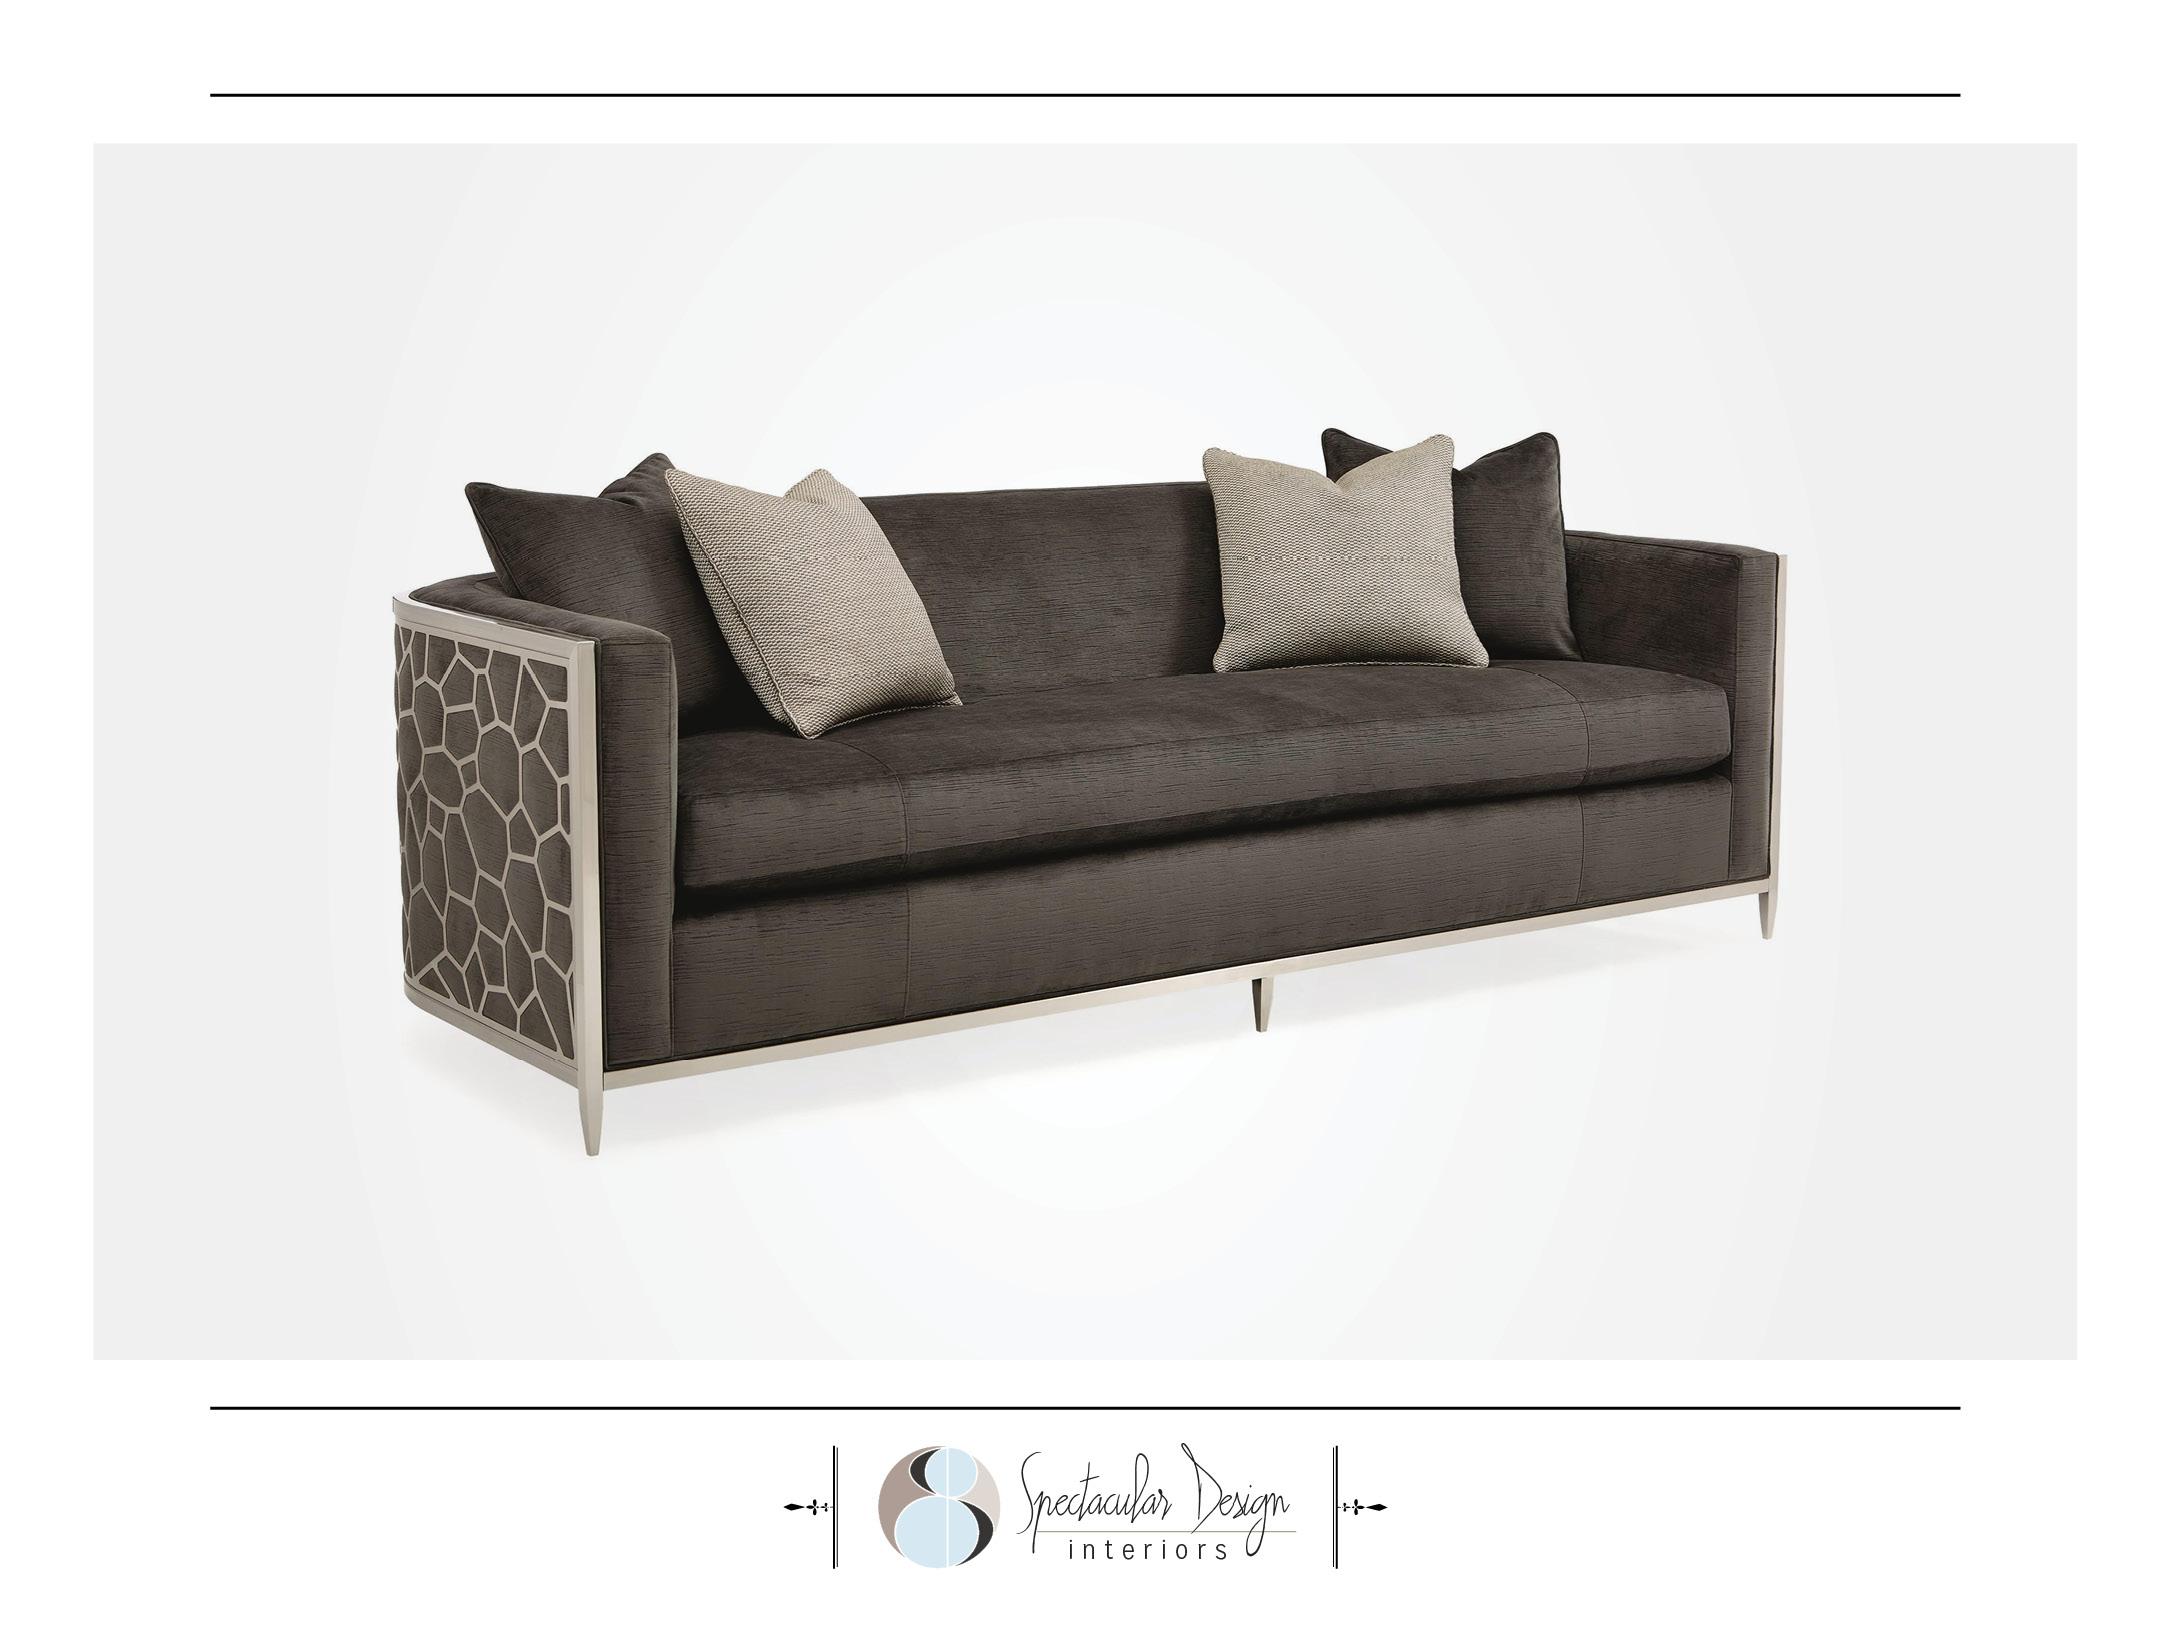 spectacular-design-showroom-showcase-sofas-custom-furniture4.jpg